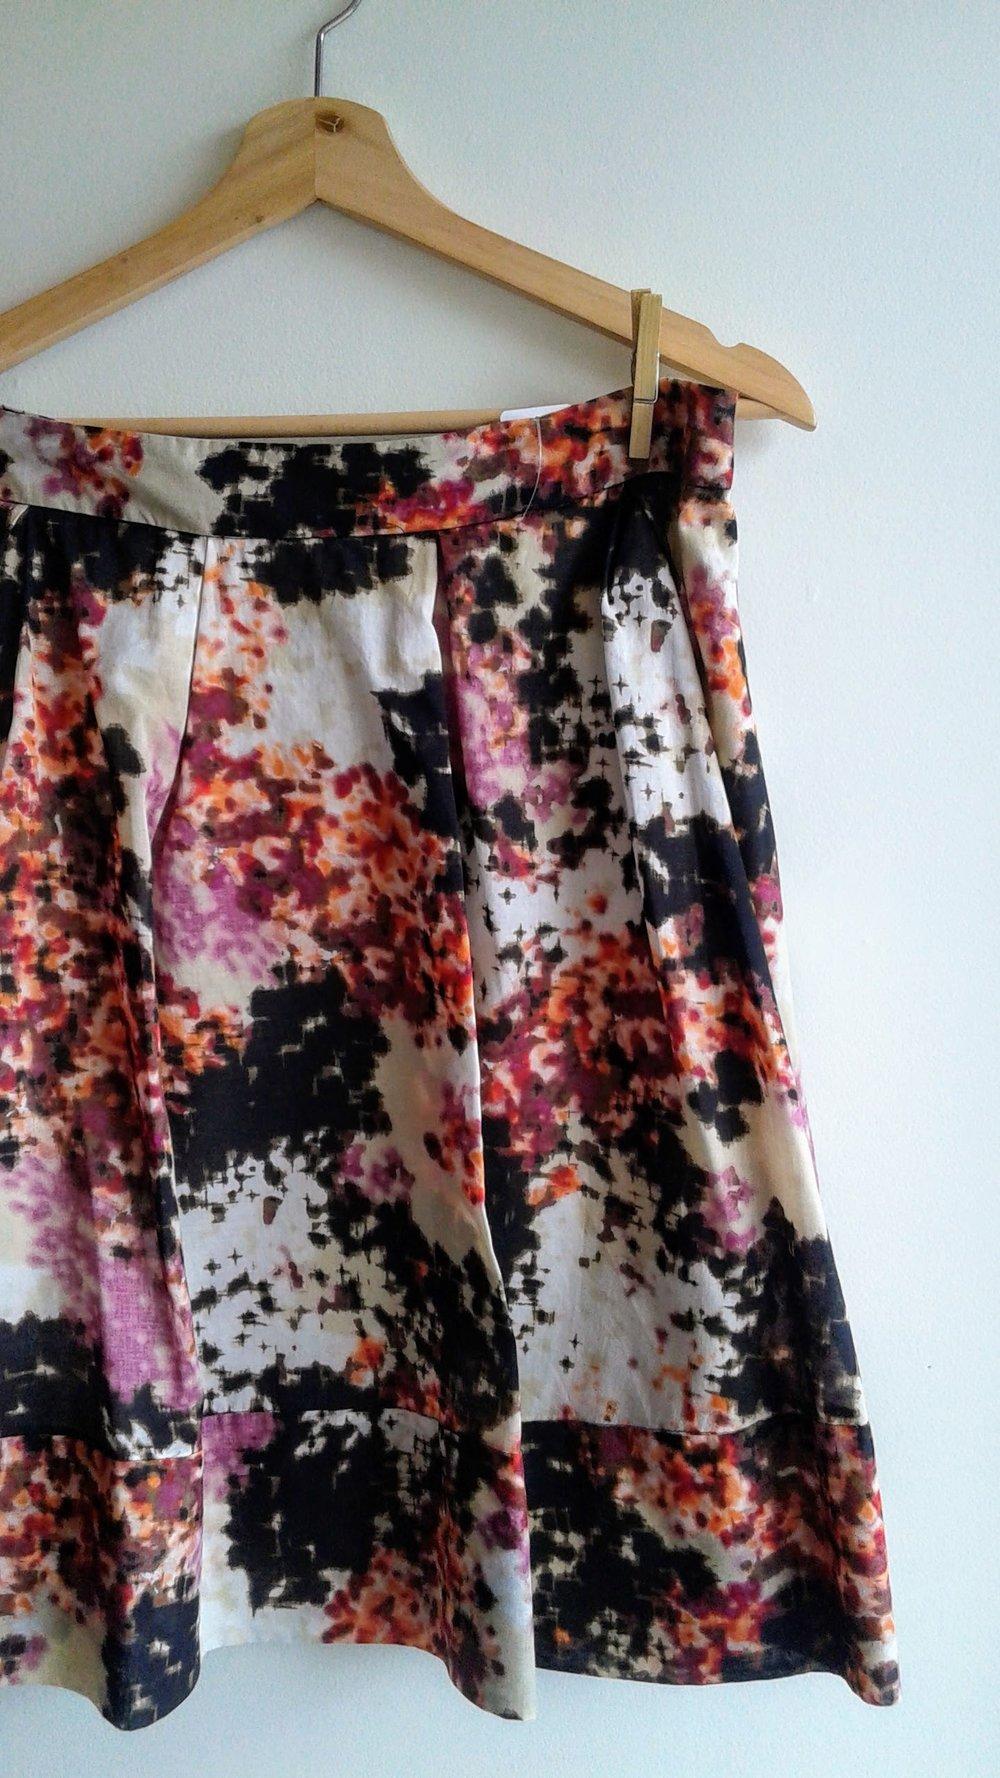 Calvin Klein skirt; Size 12, $32